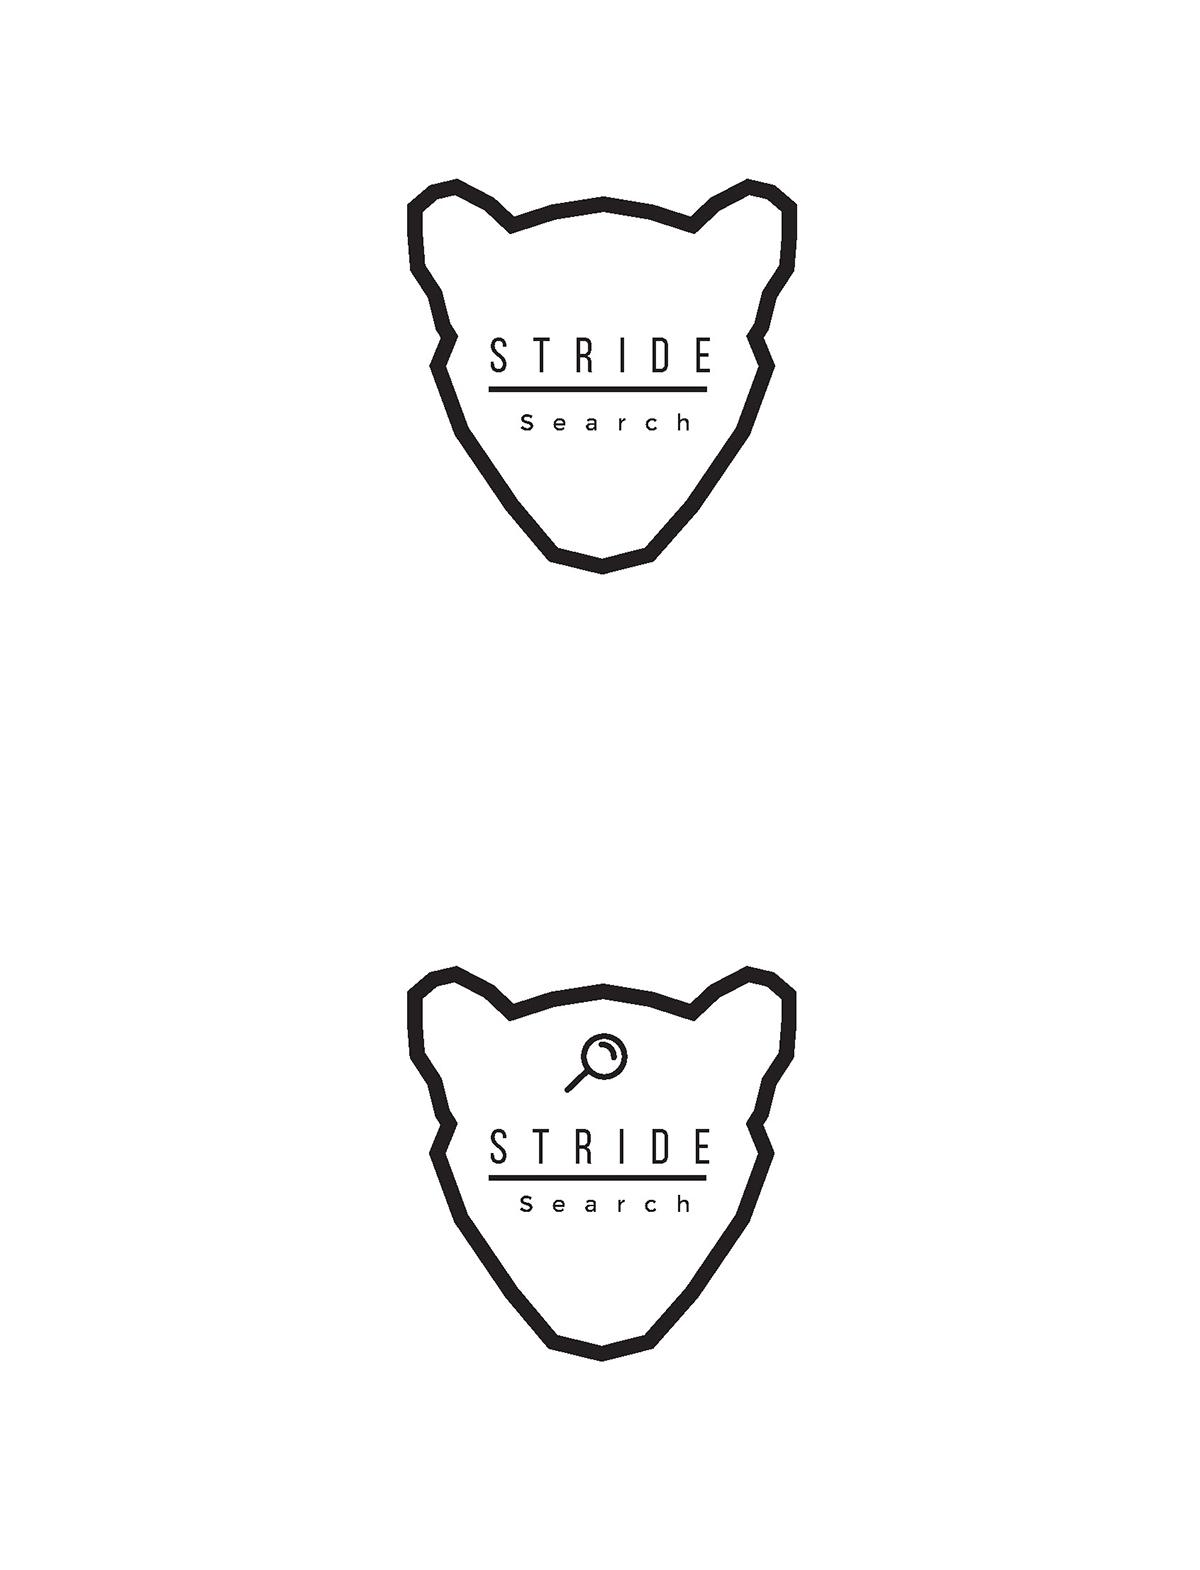 stride search concept 4 cheetah logo 1